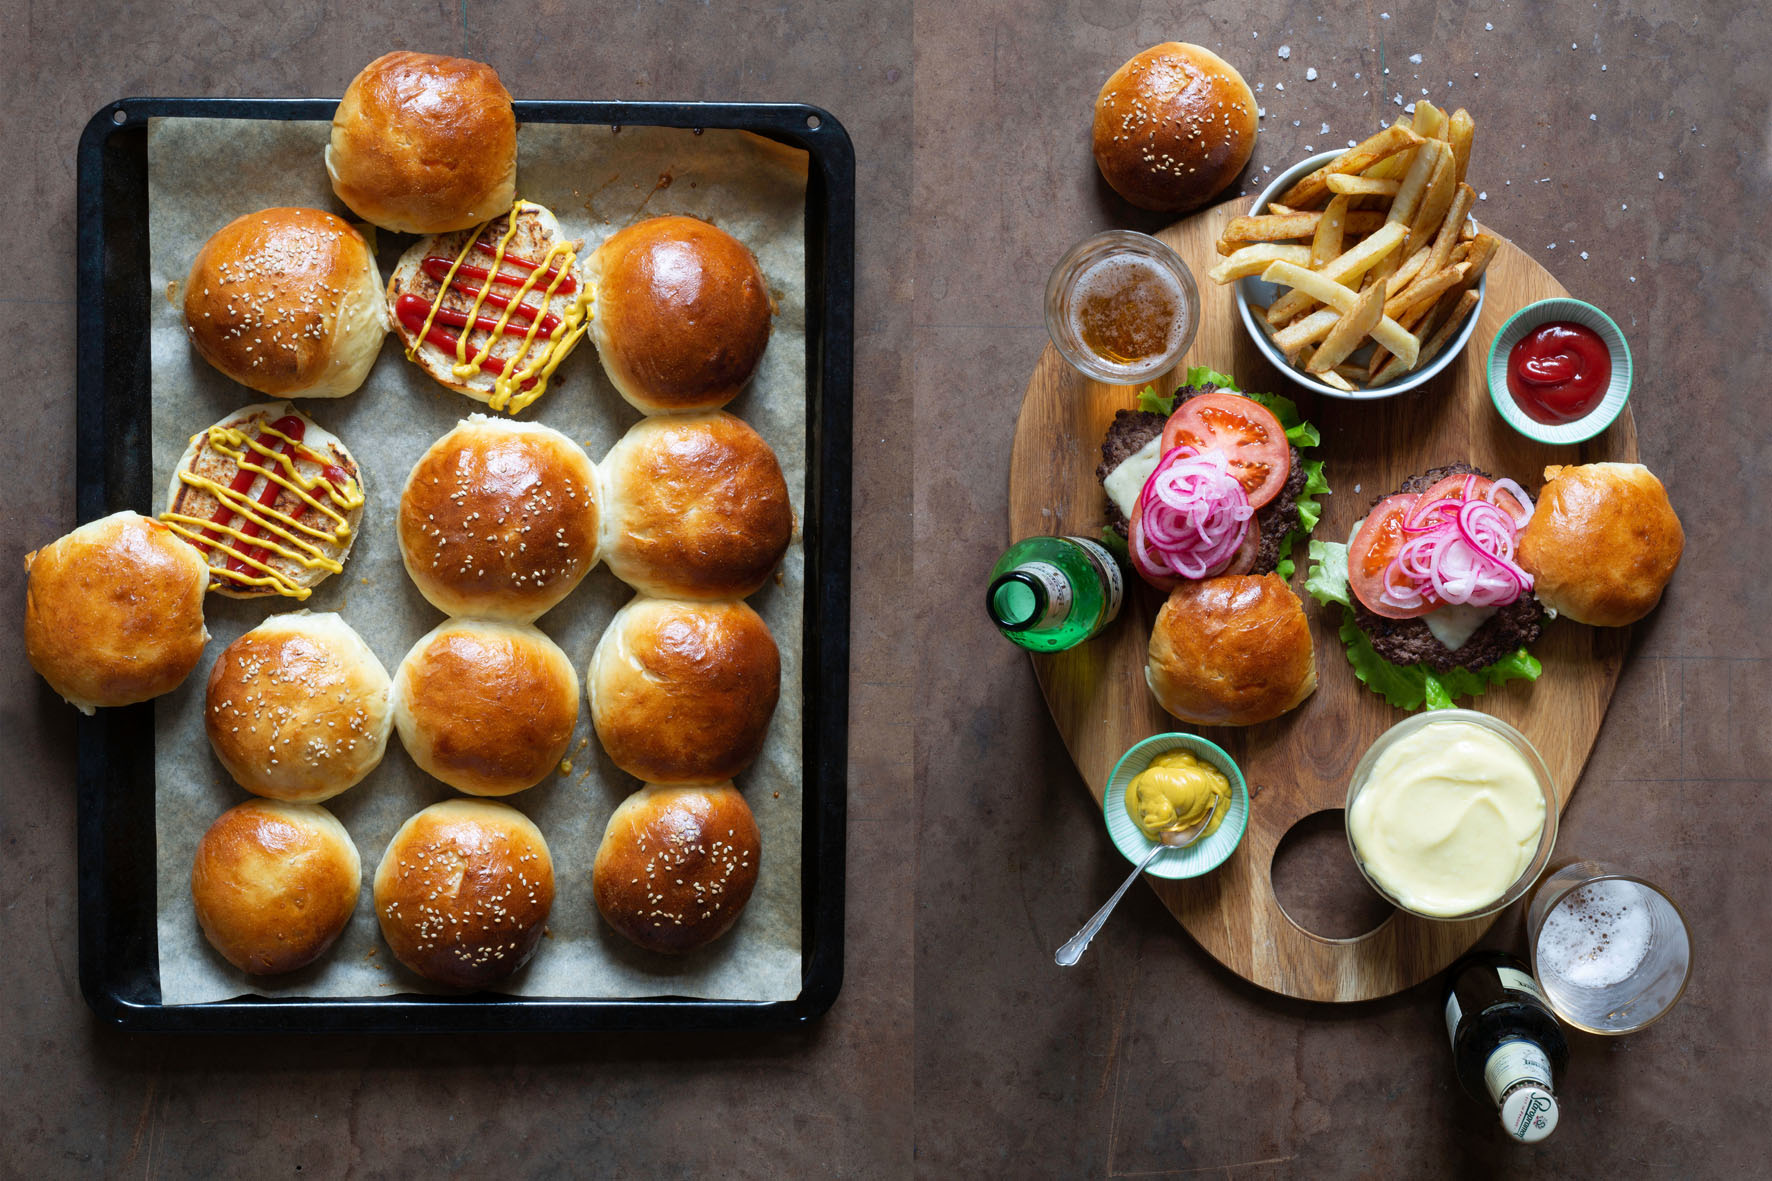 skogtillbord-hamburgerbröd-maj20